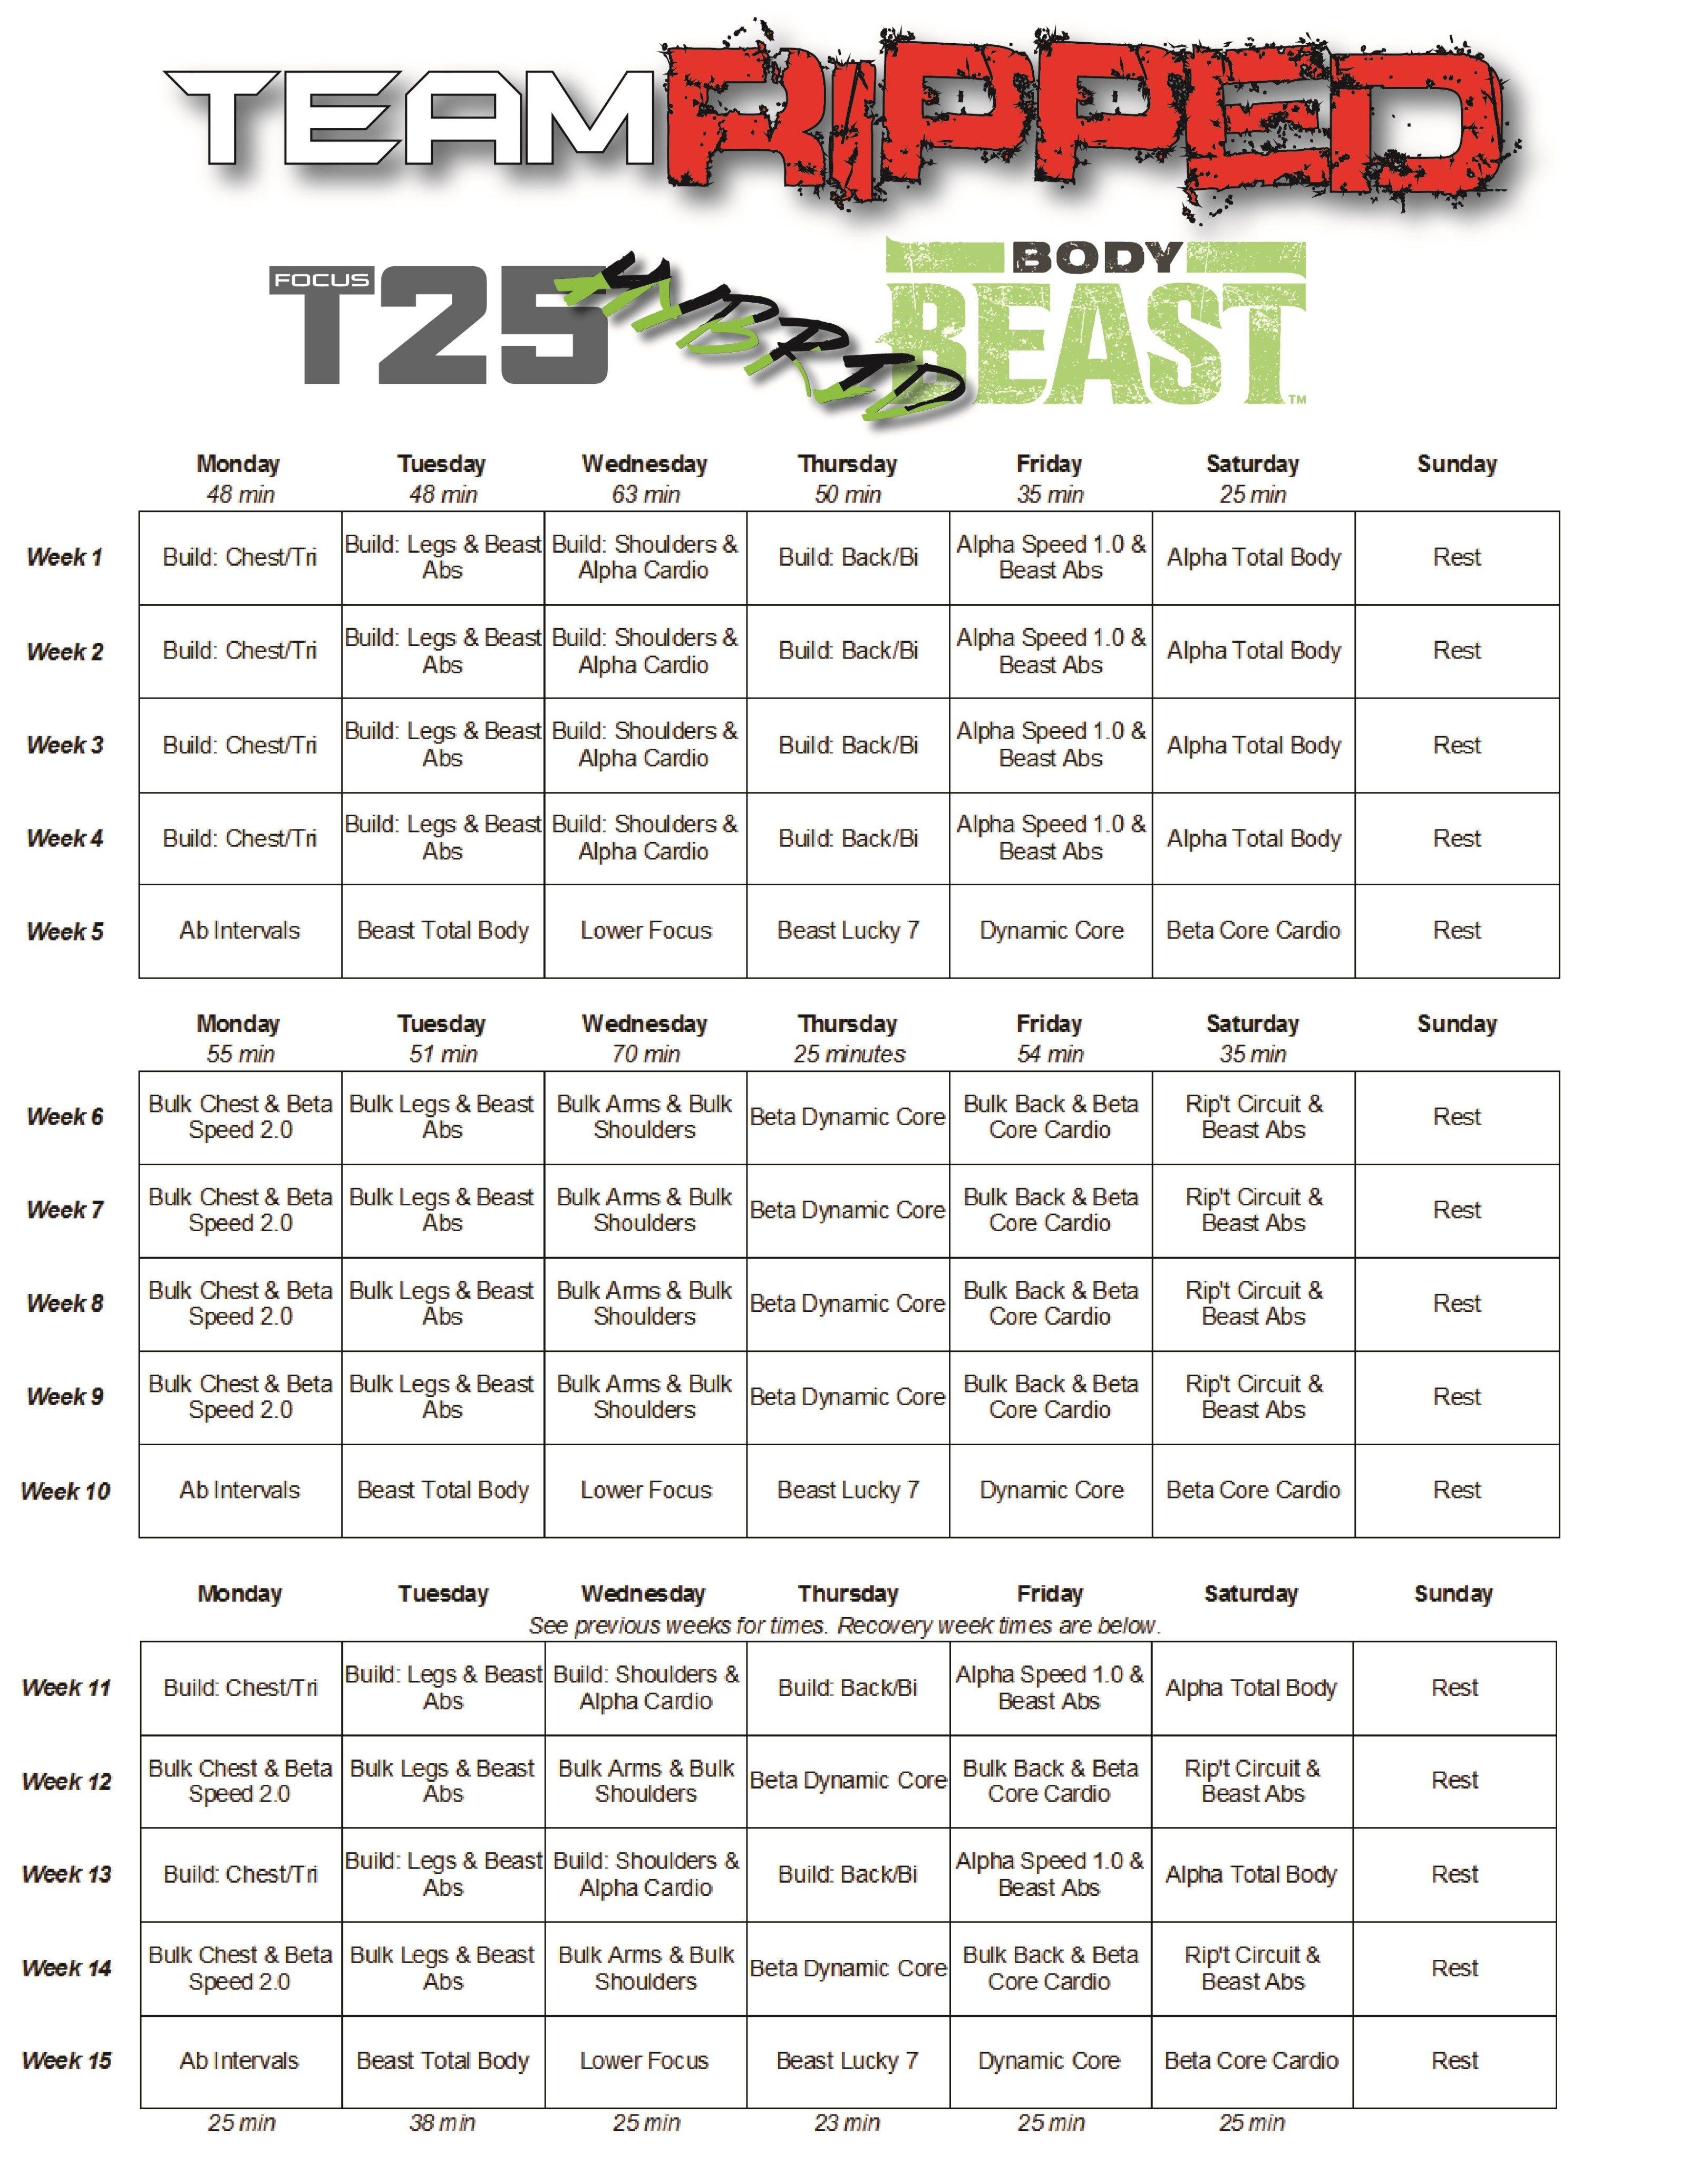 Body Beast Hybrids! You've Asked For Them! Body Beast regarding Body Beast Hybrid Calendar